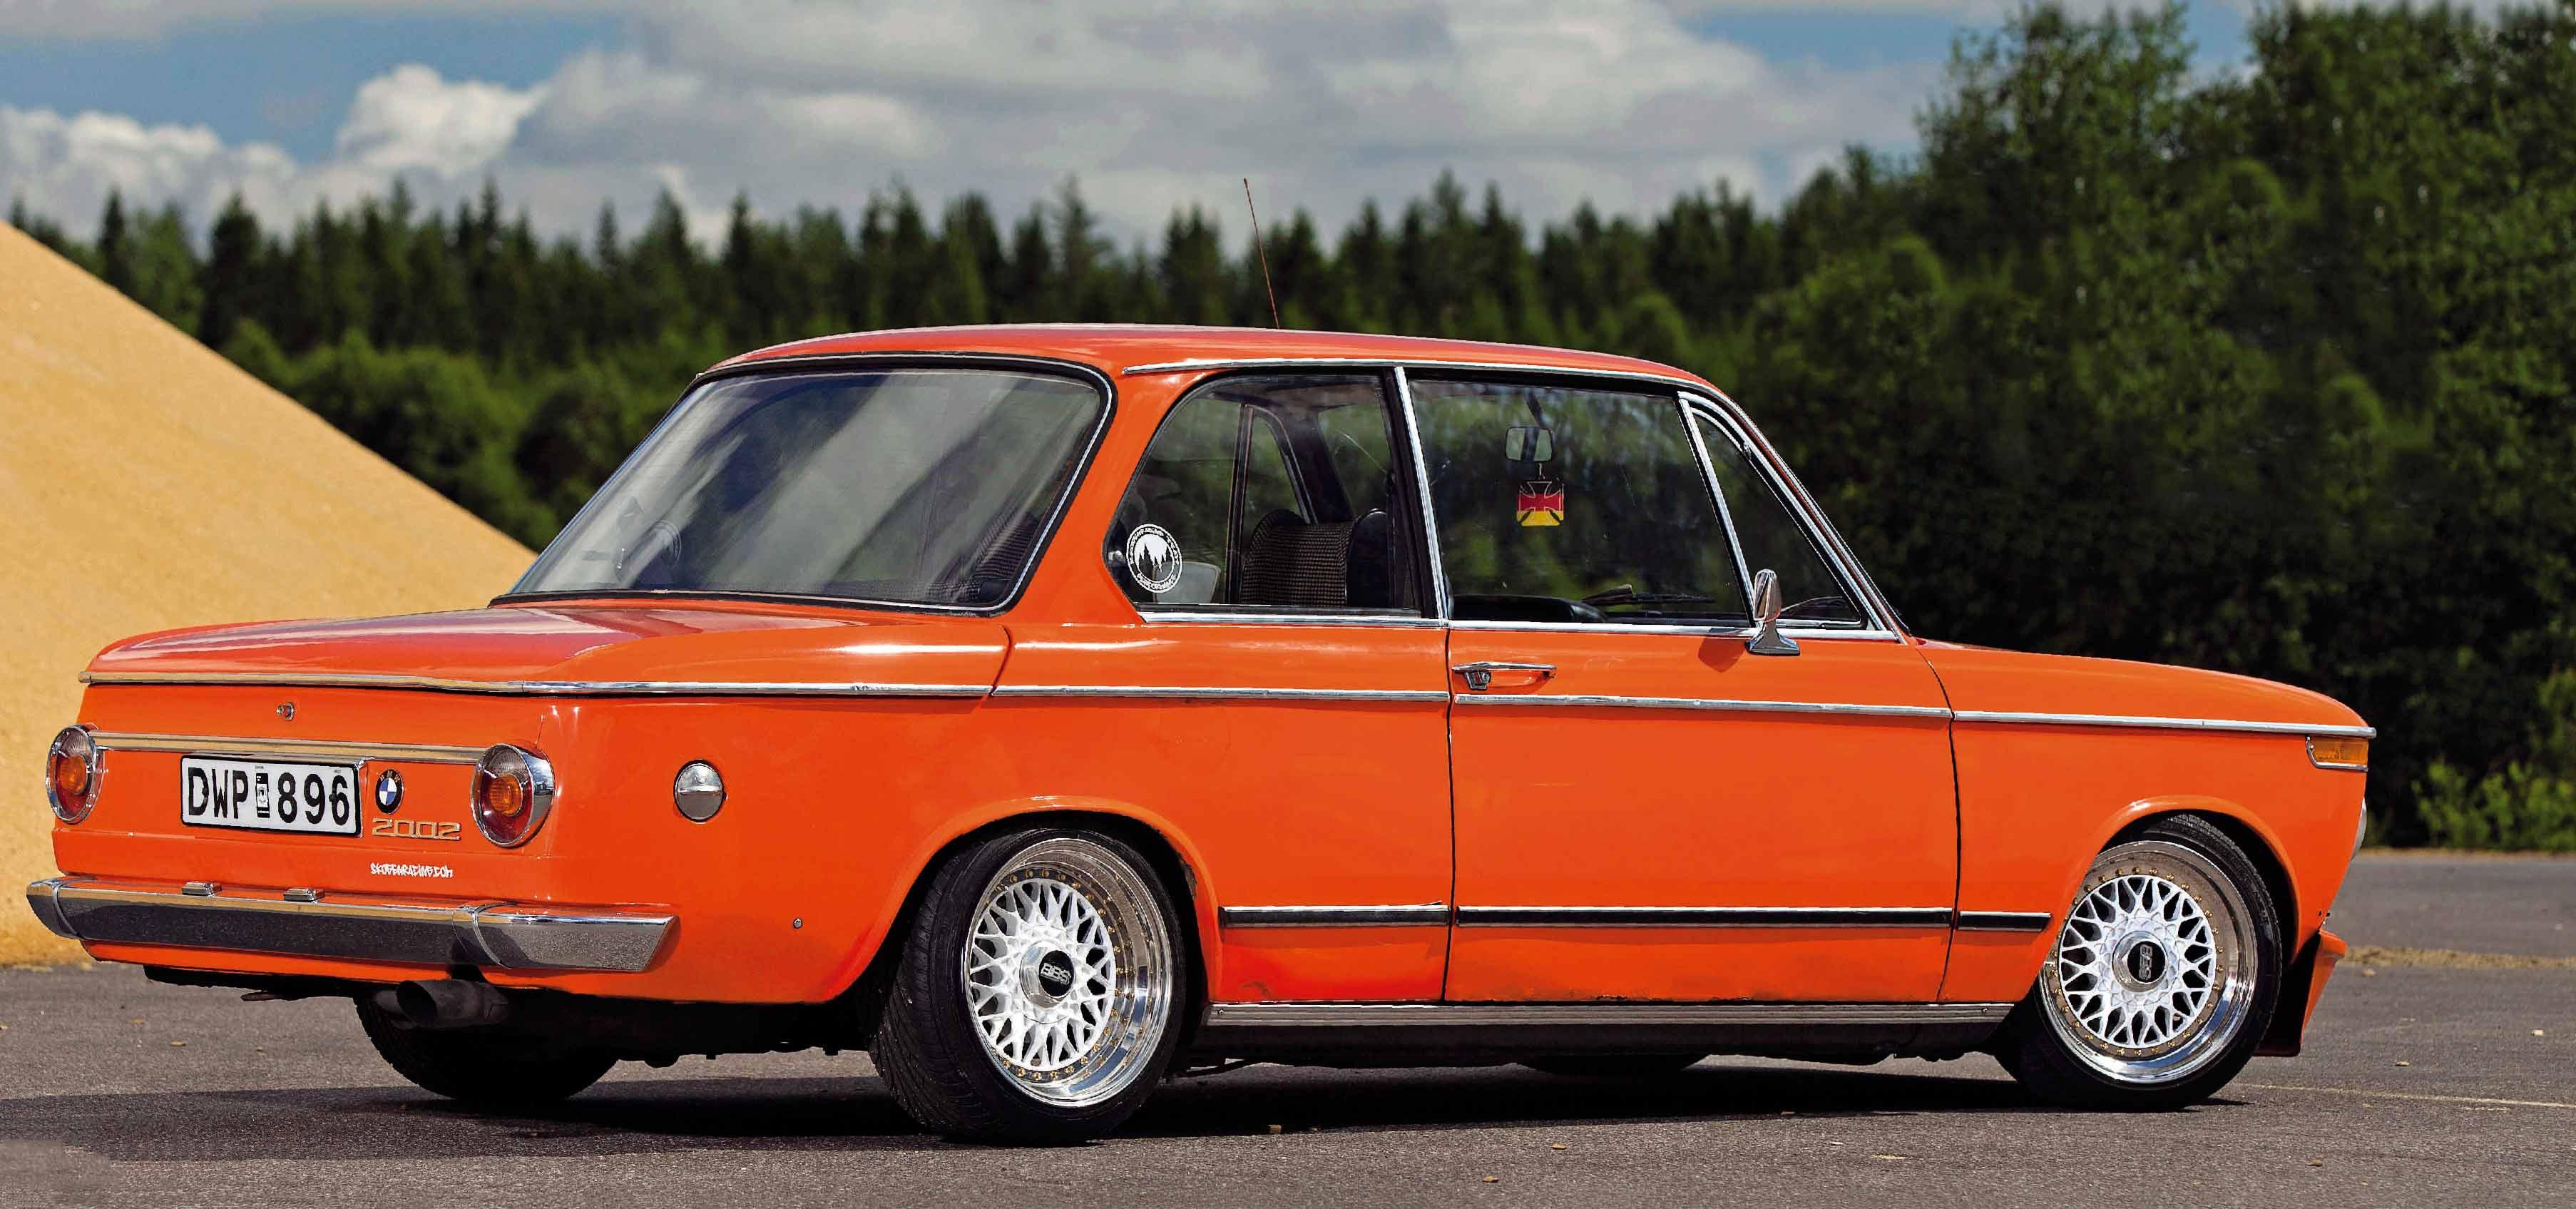 322whp M10b18 Turbo Bmw 1602 Drive My Blogs Drive